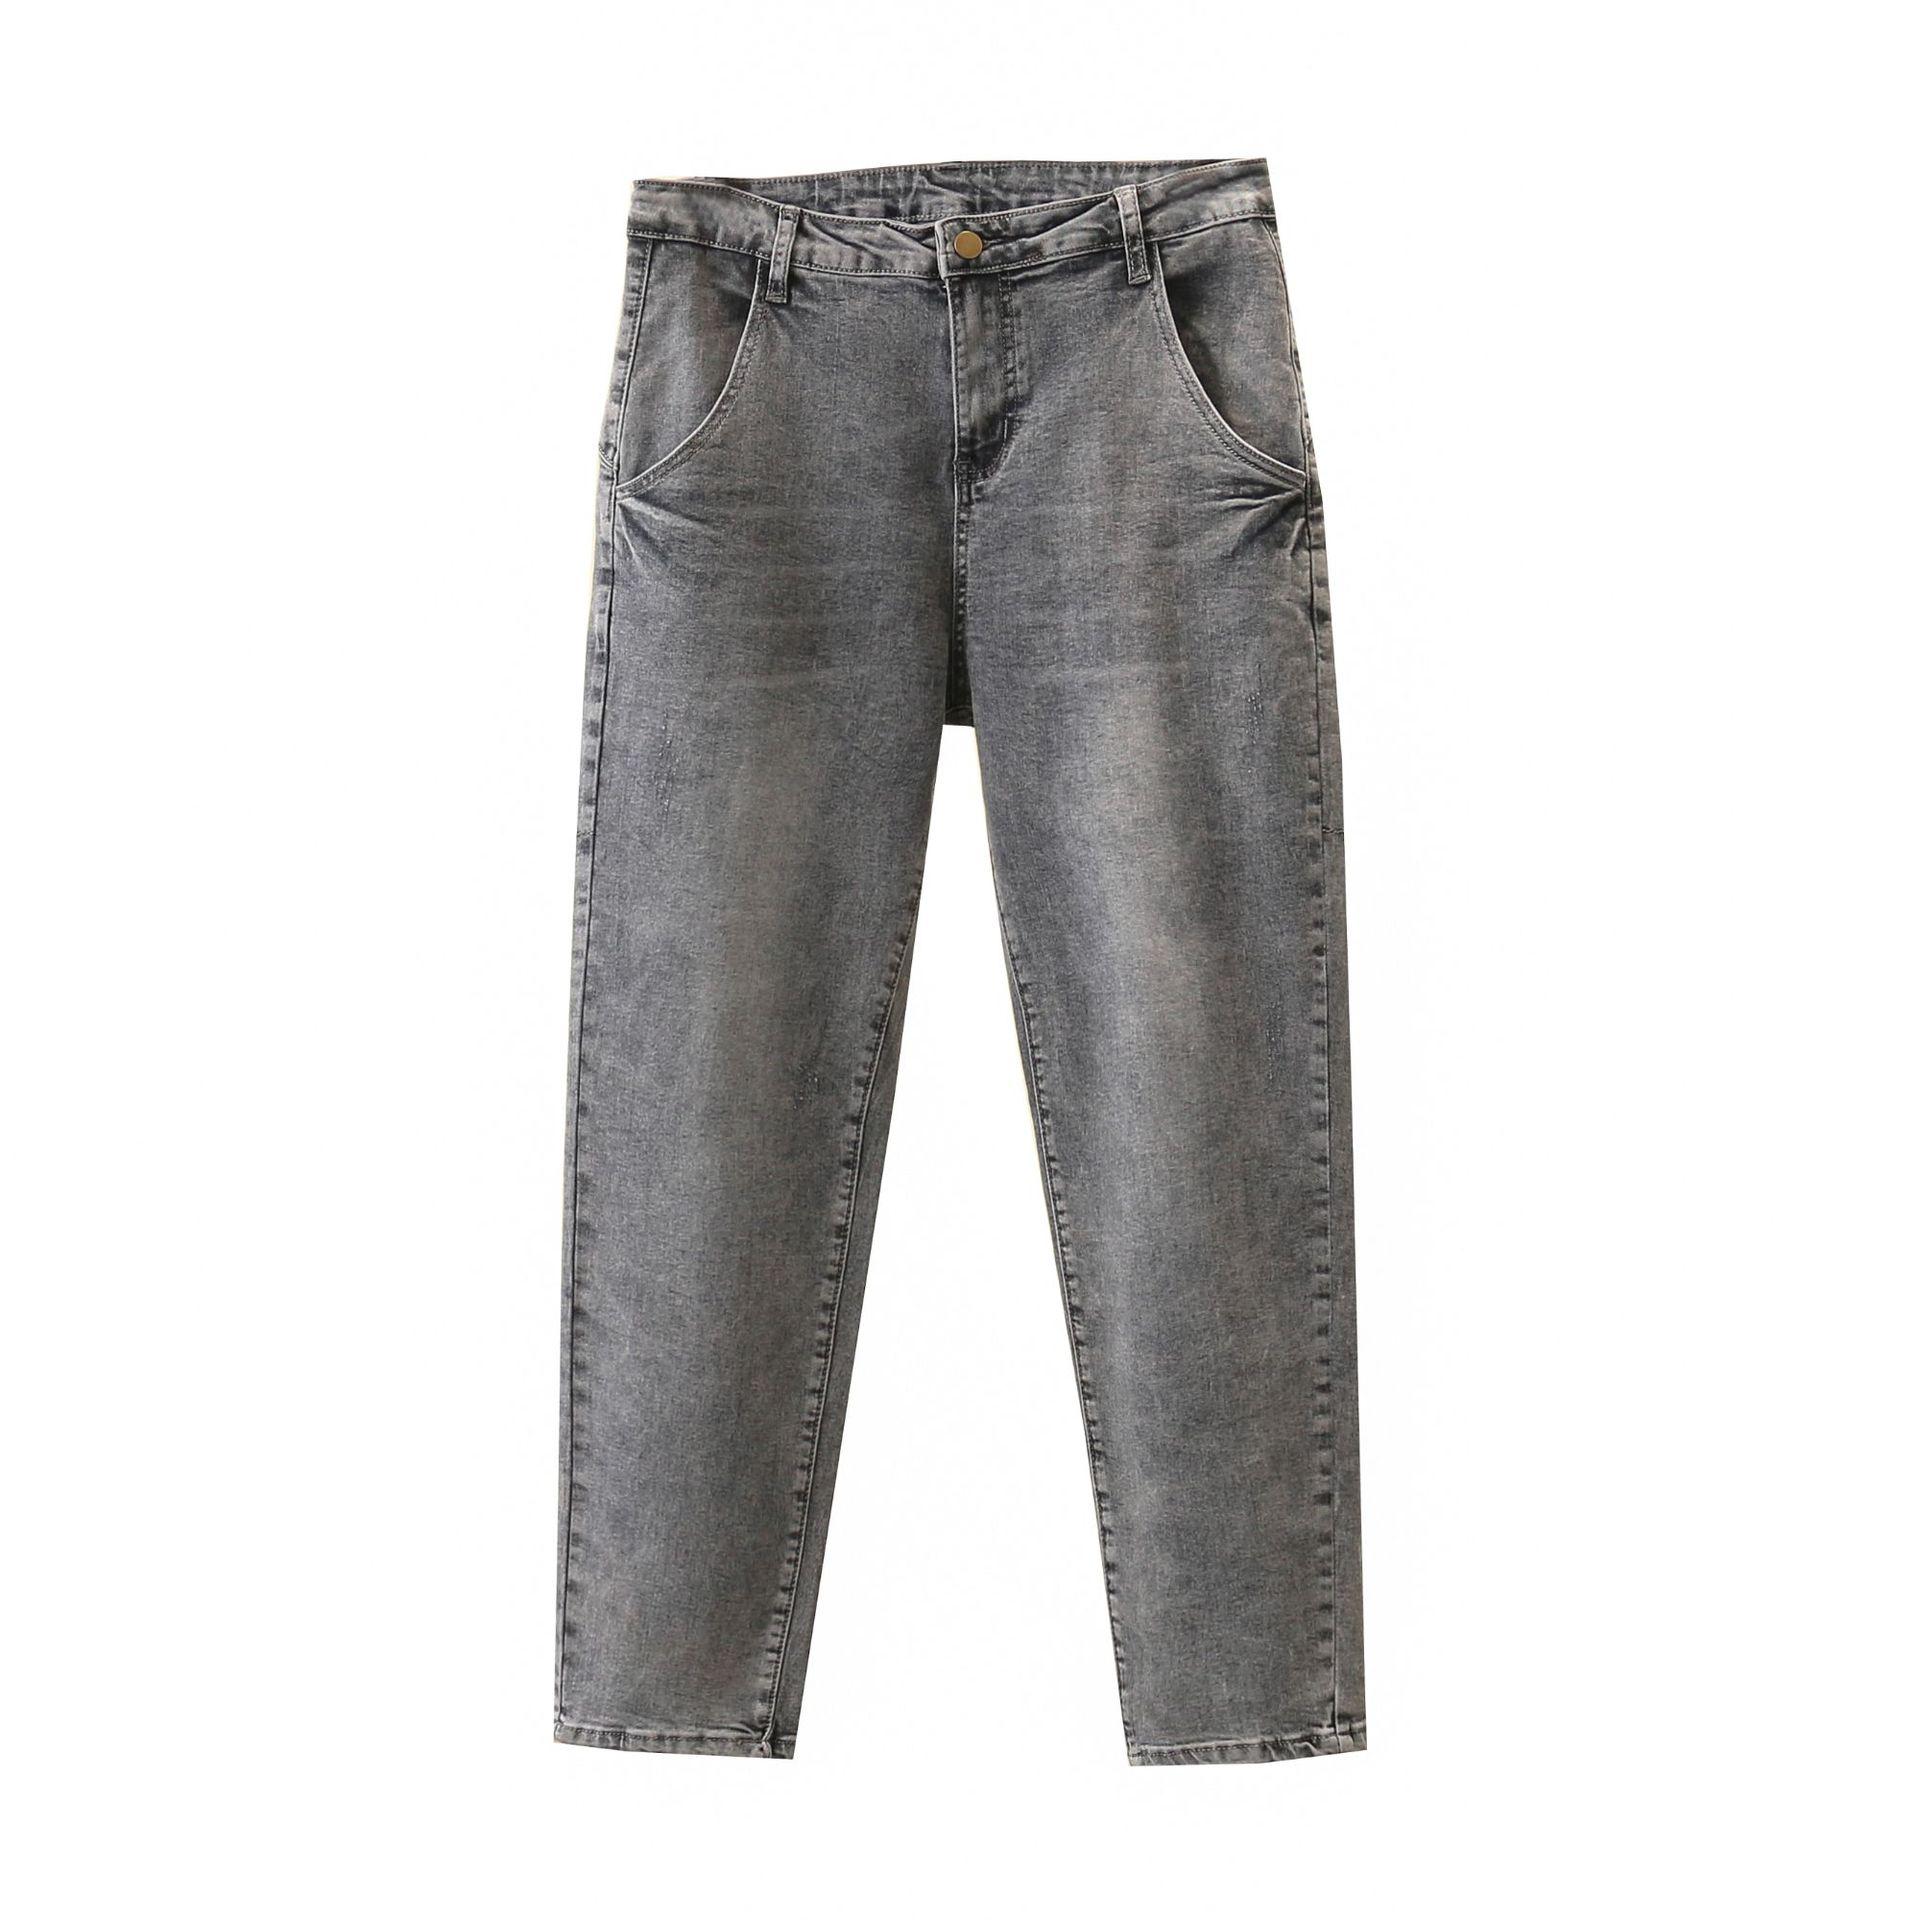 Lady Jeans Spring Plus Size Harem Pants Women Denim Trousers Gray Female High Waist Jeans Casual S61-0968